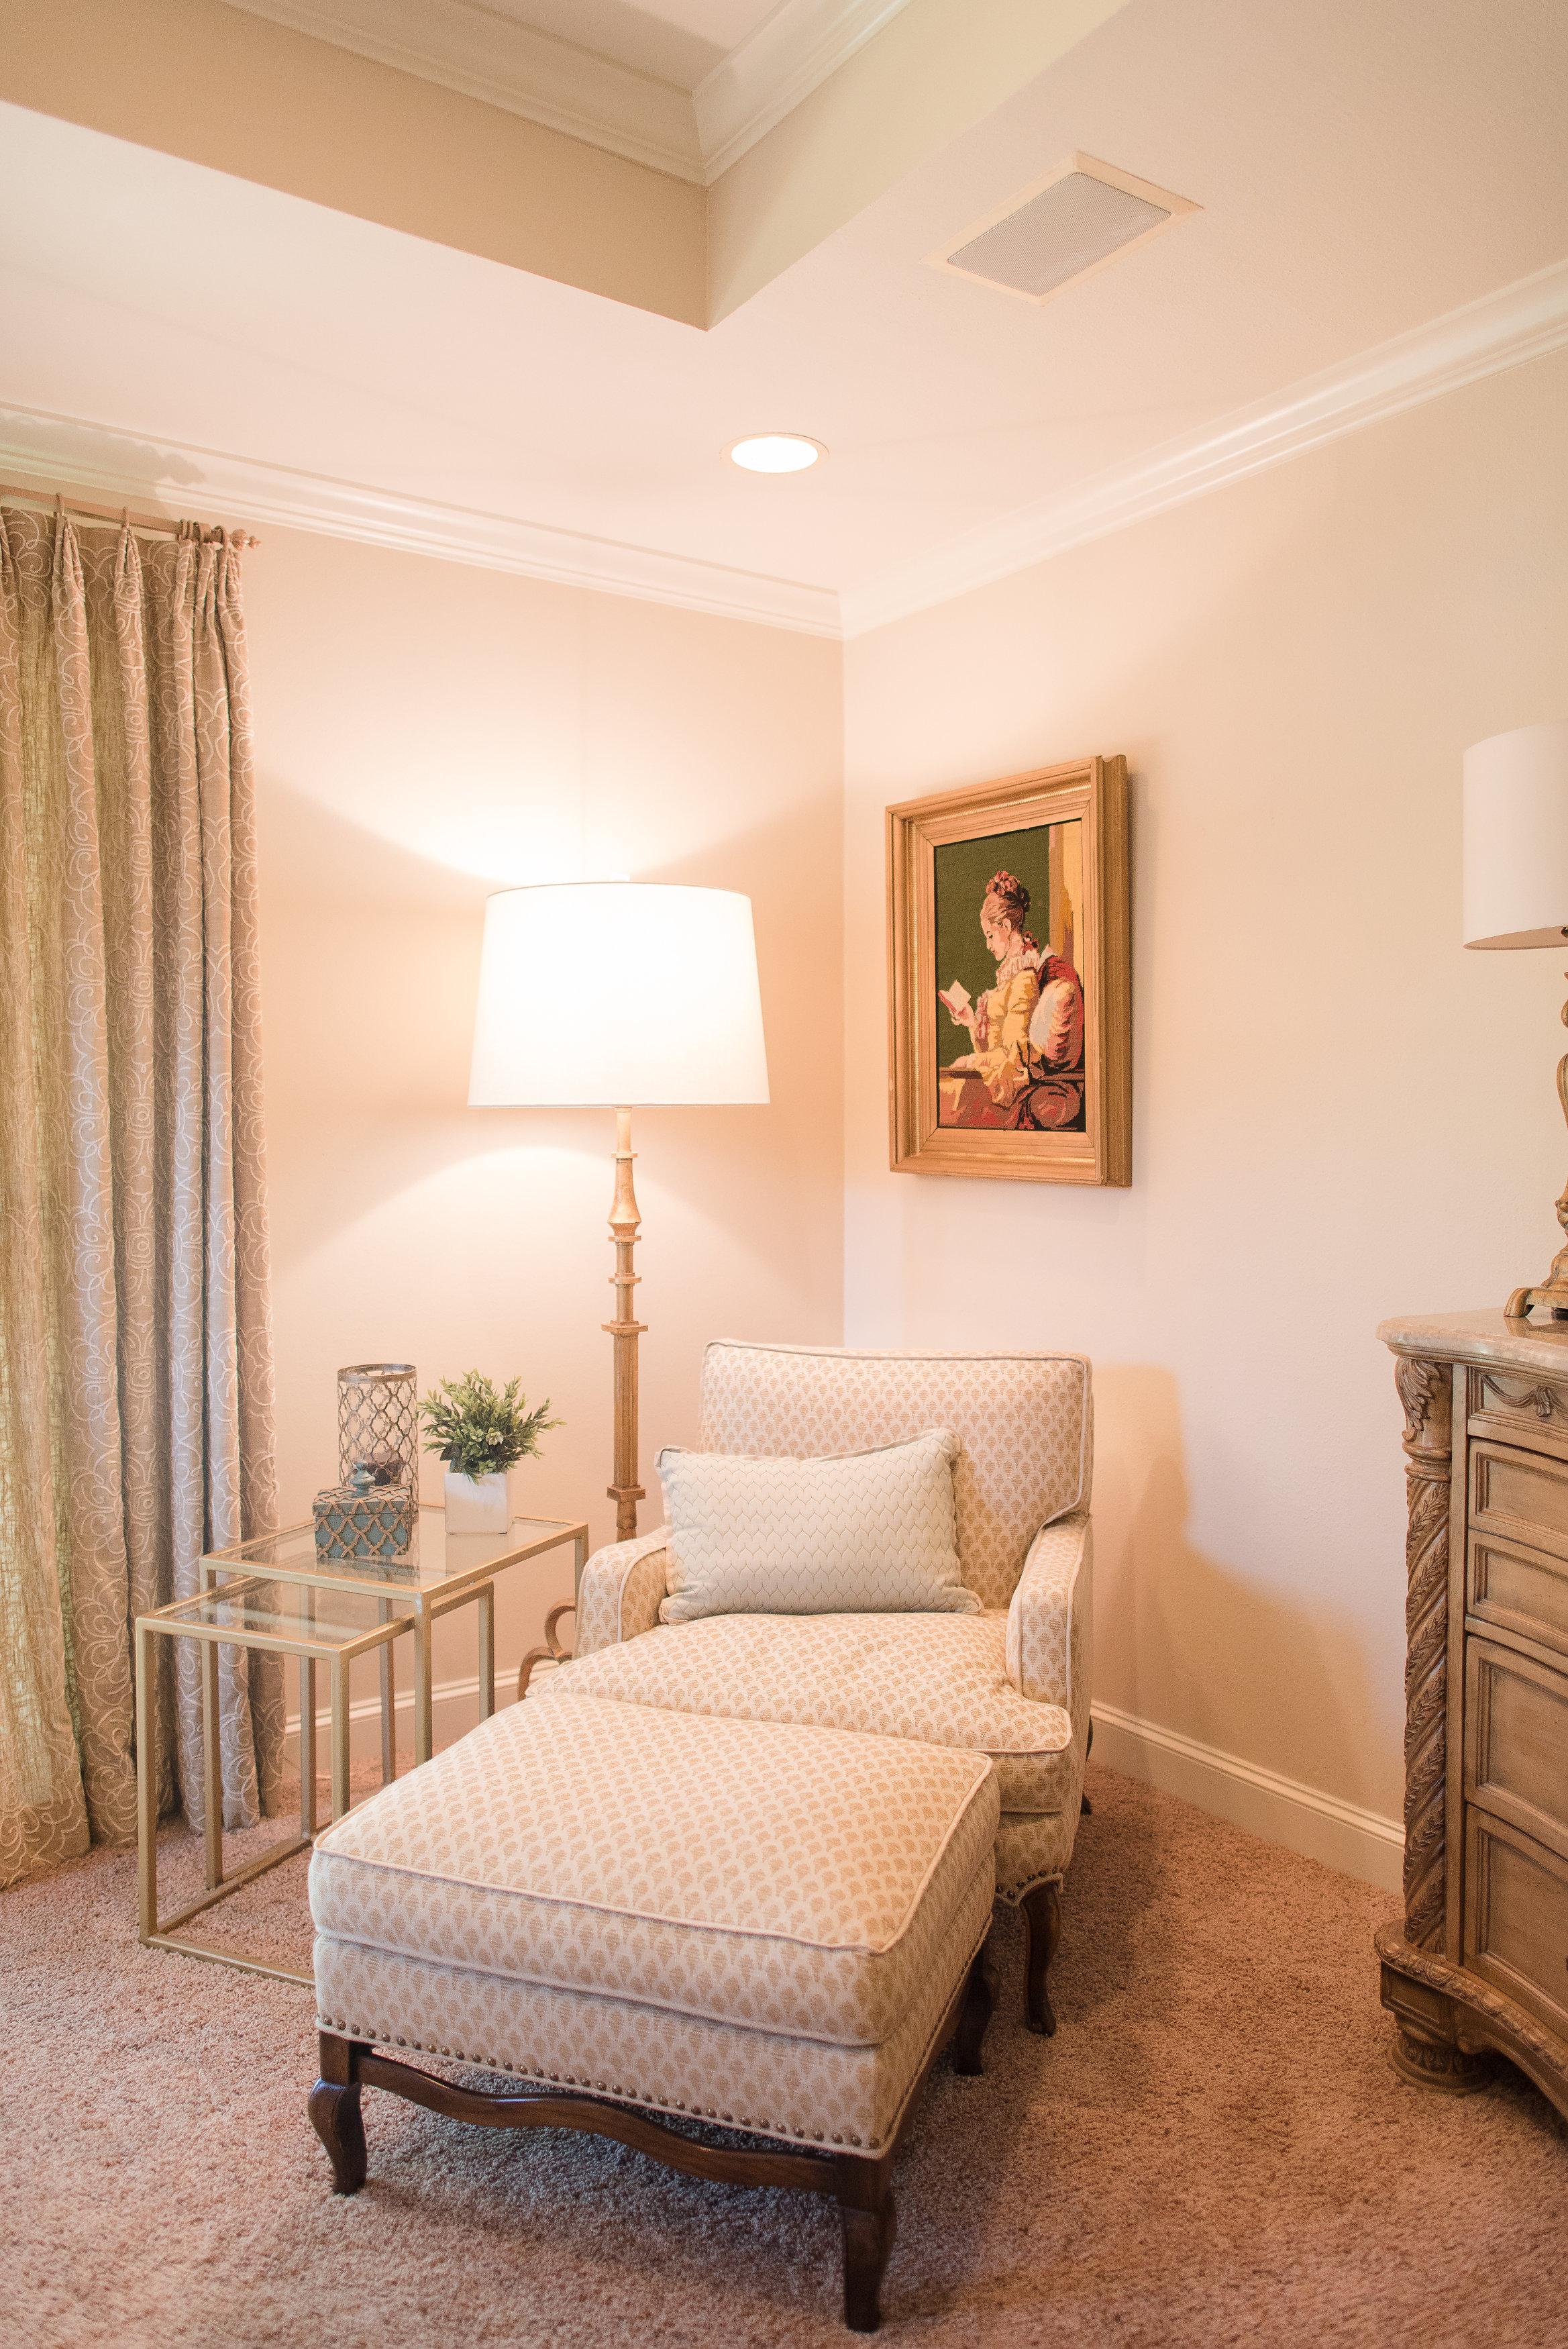 Interior Design by Clark Design and Renovation